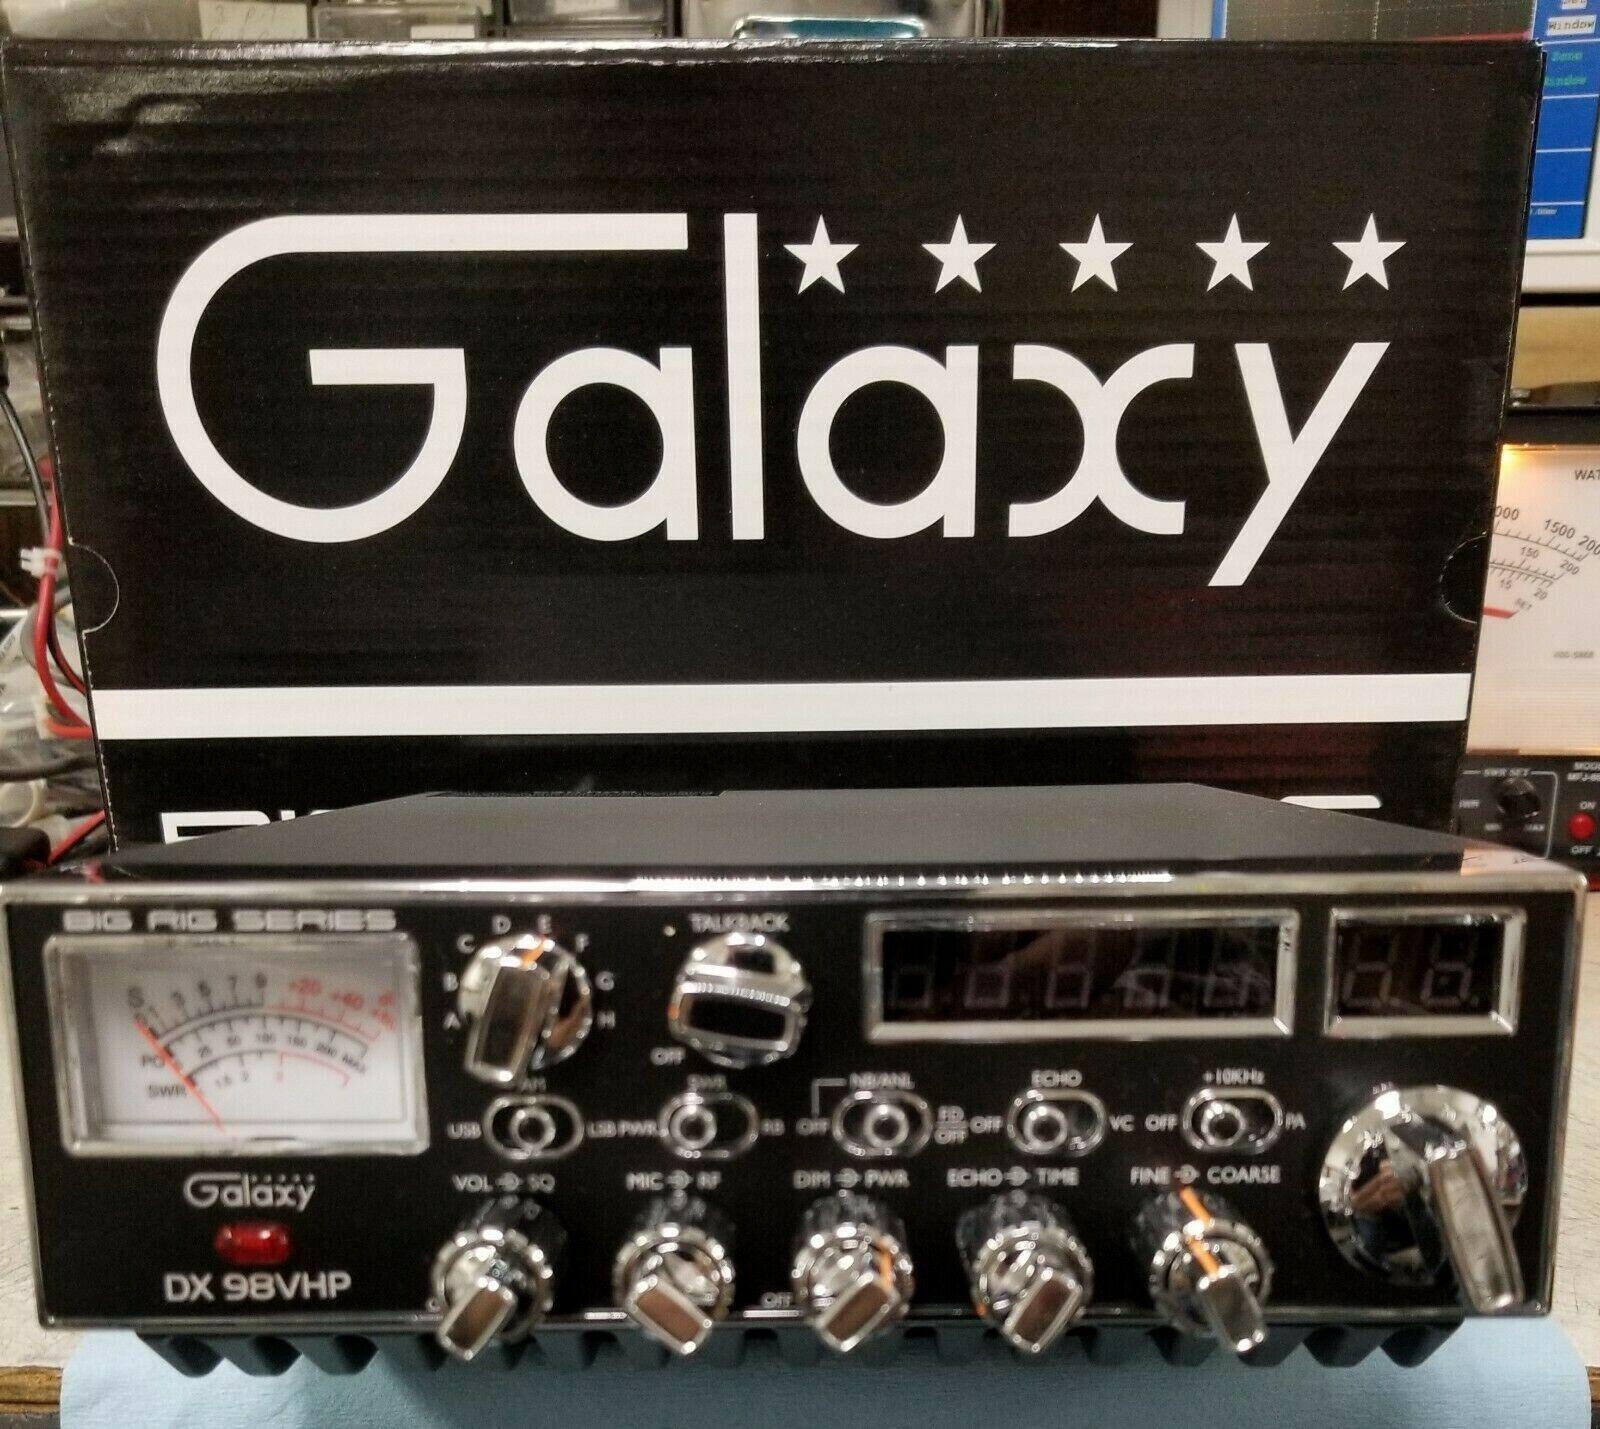 GALAXY DX98VHP